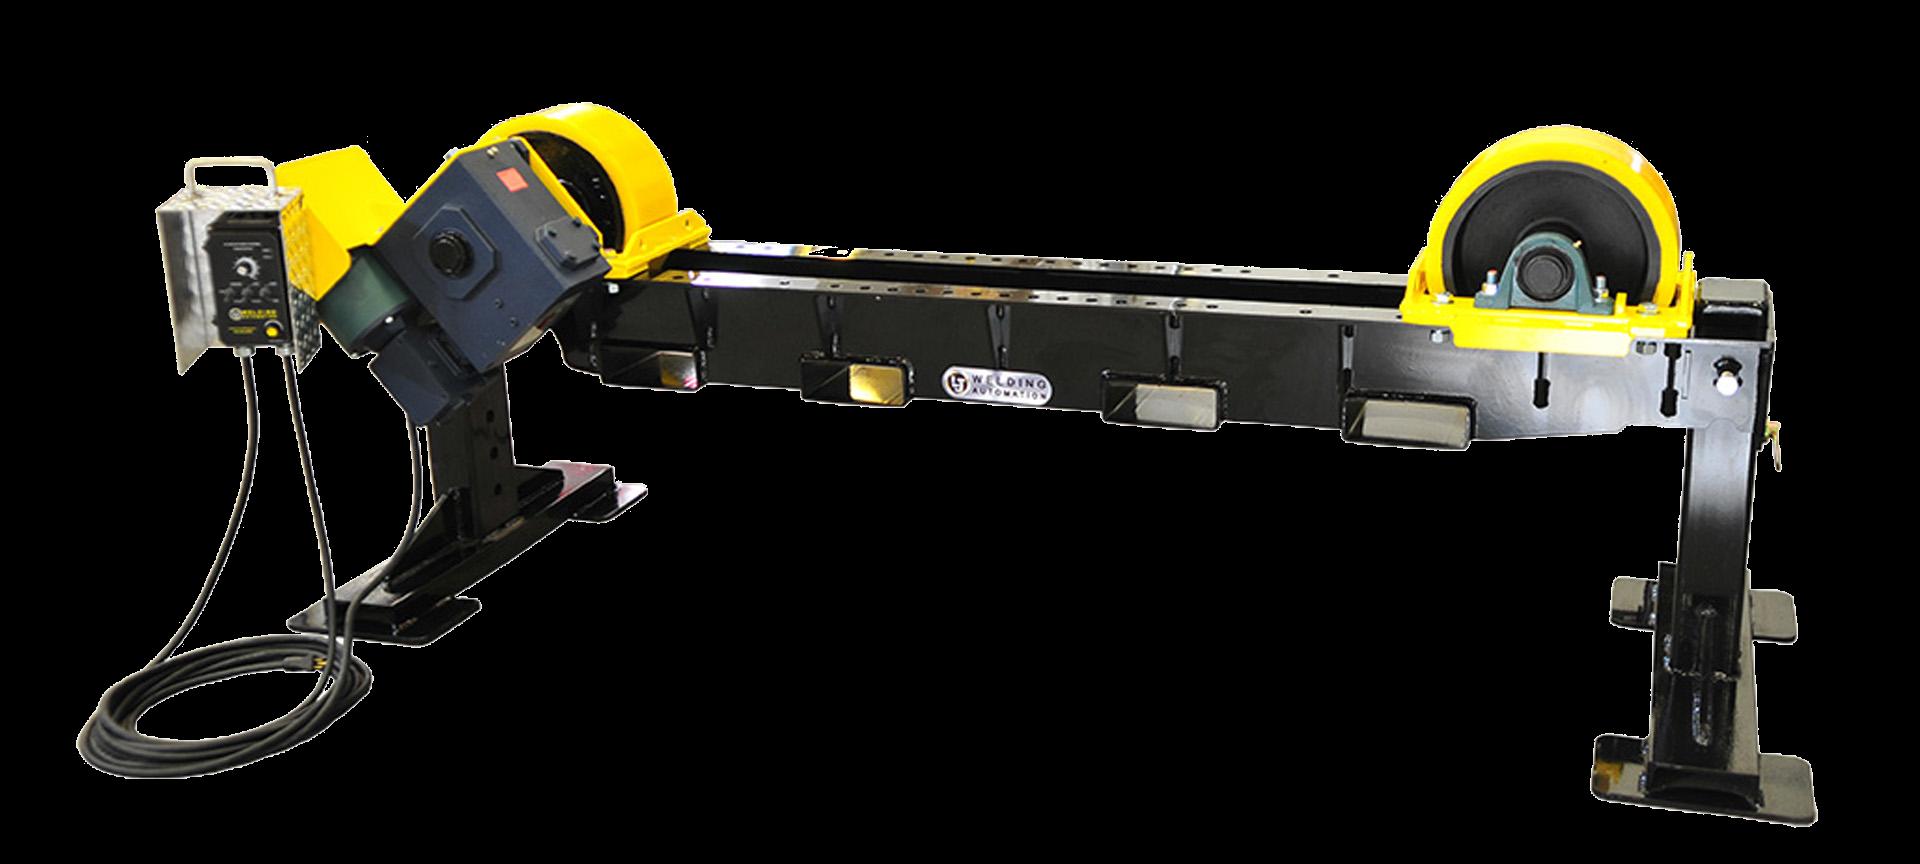 12-ton height adjust tank turning roll driver unit